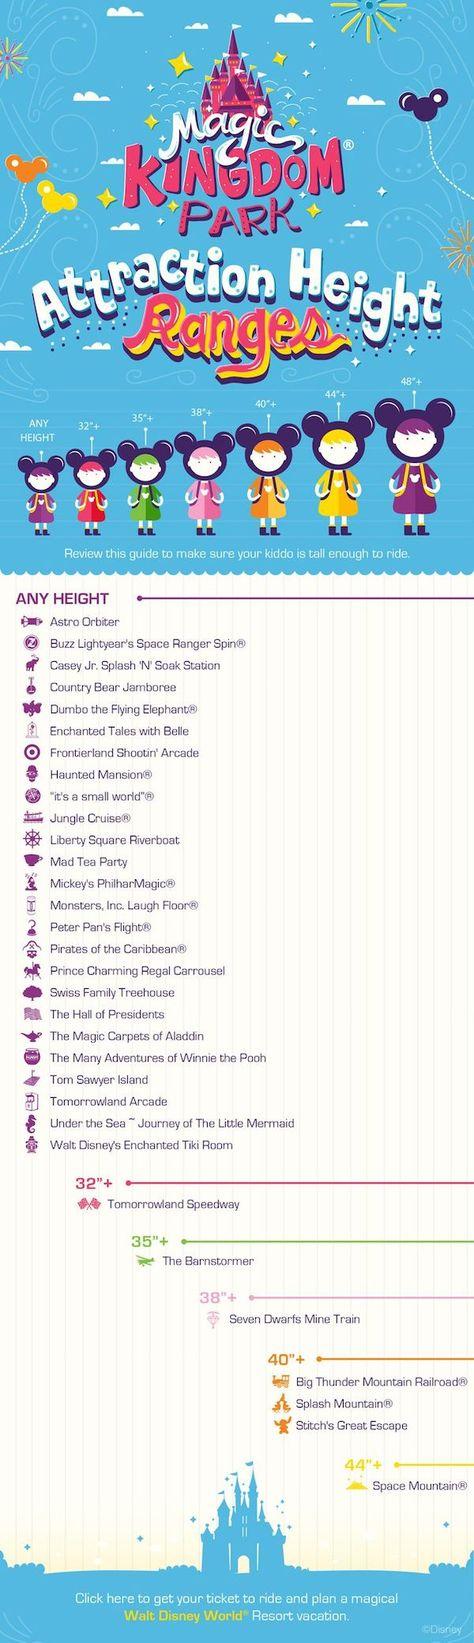 #DisneyKids: Height Requirements for Attractions at Walt Disney World Resort